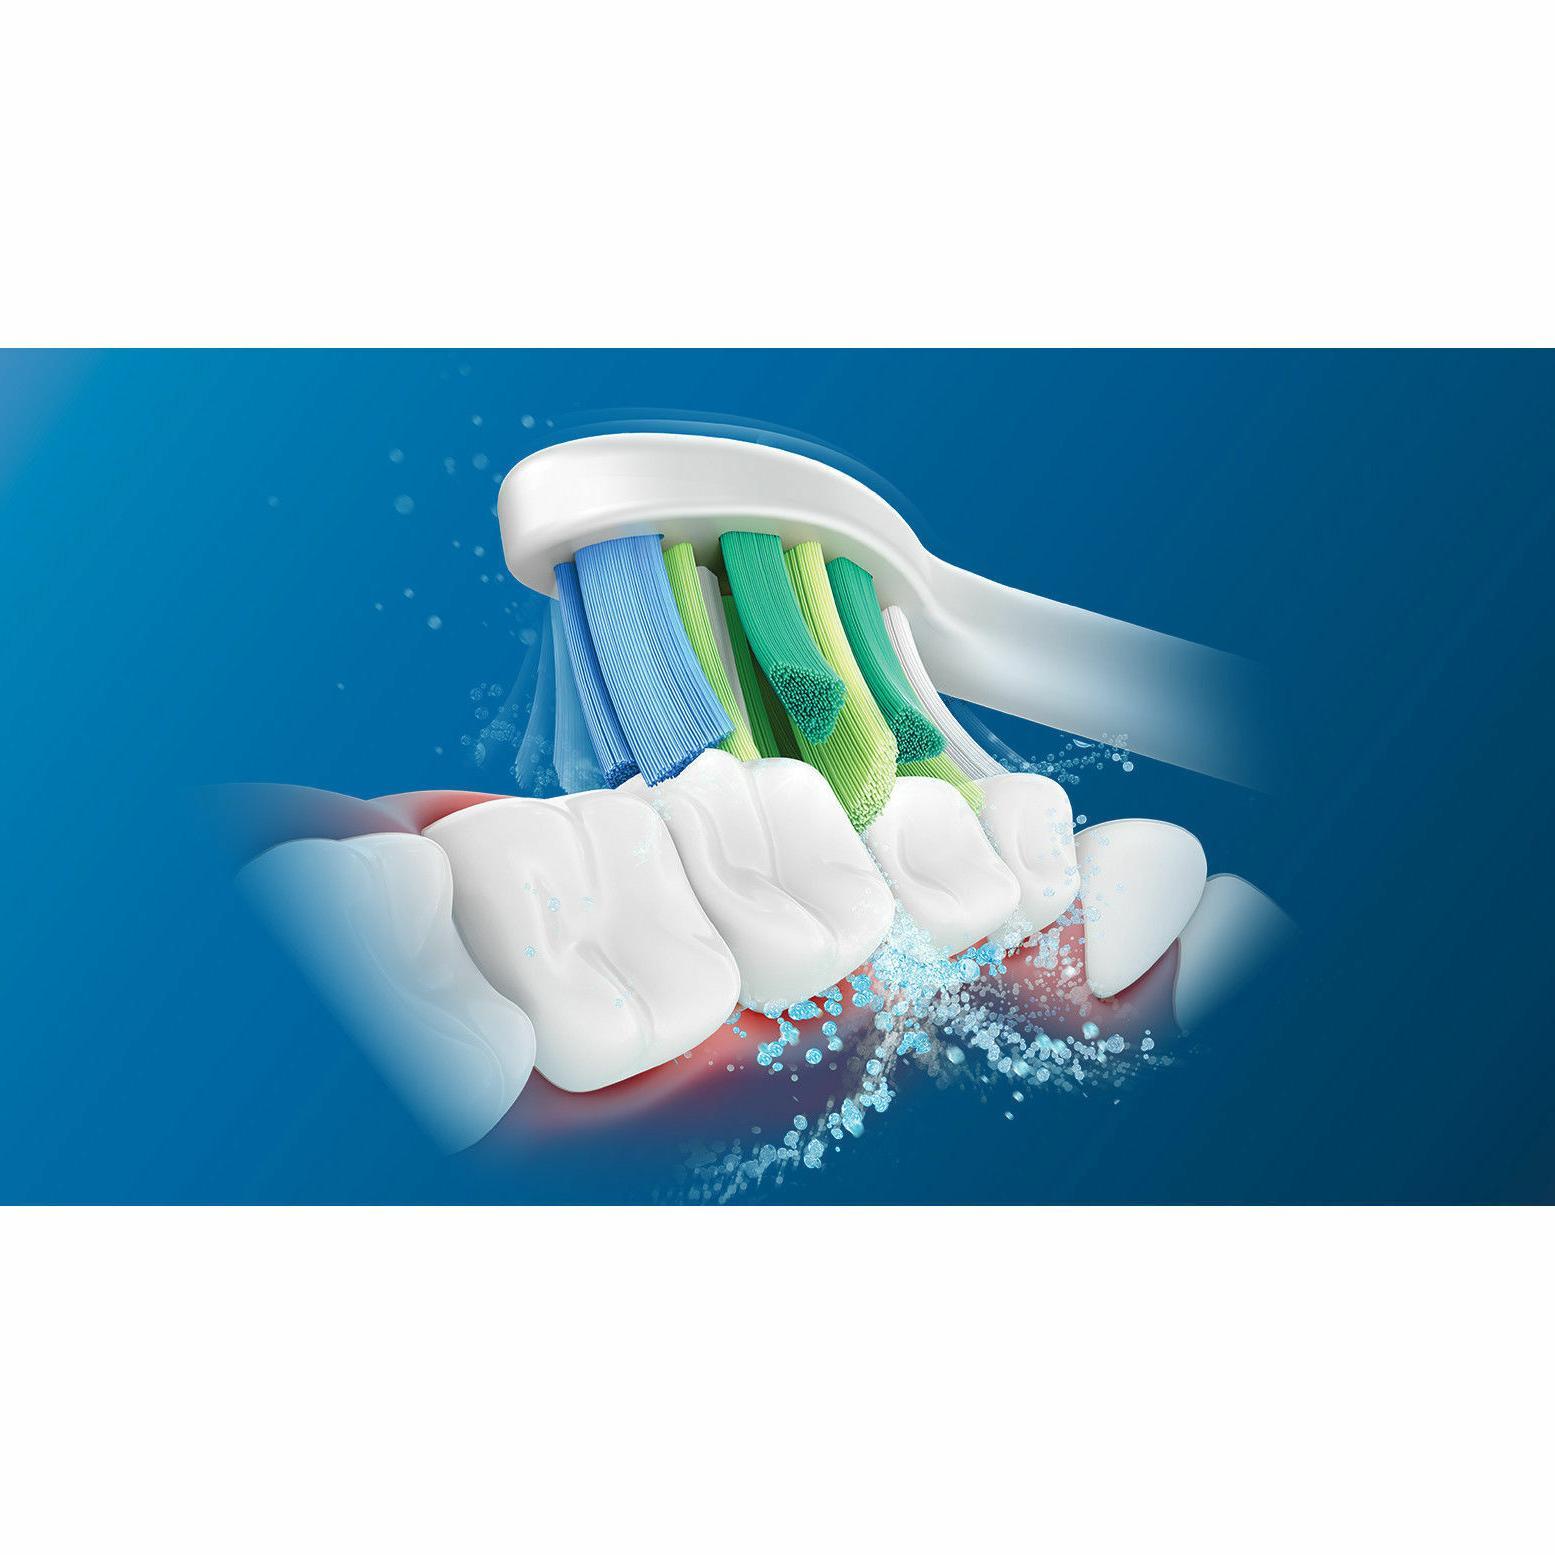 3pcs InterCare Toothbrush Heads w/o Box